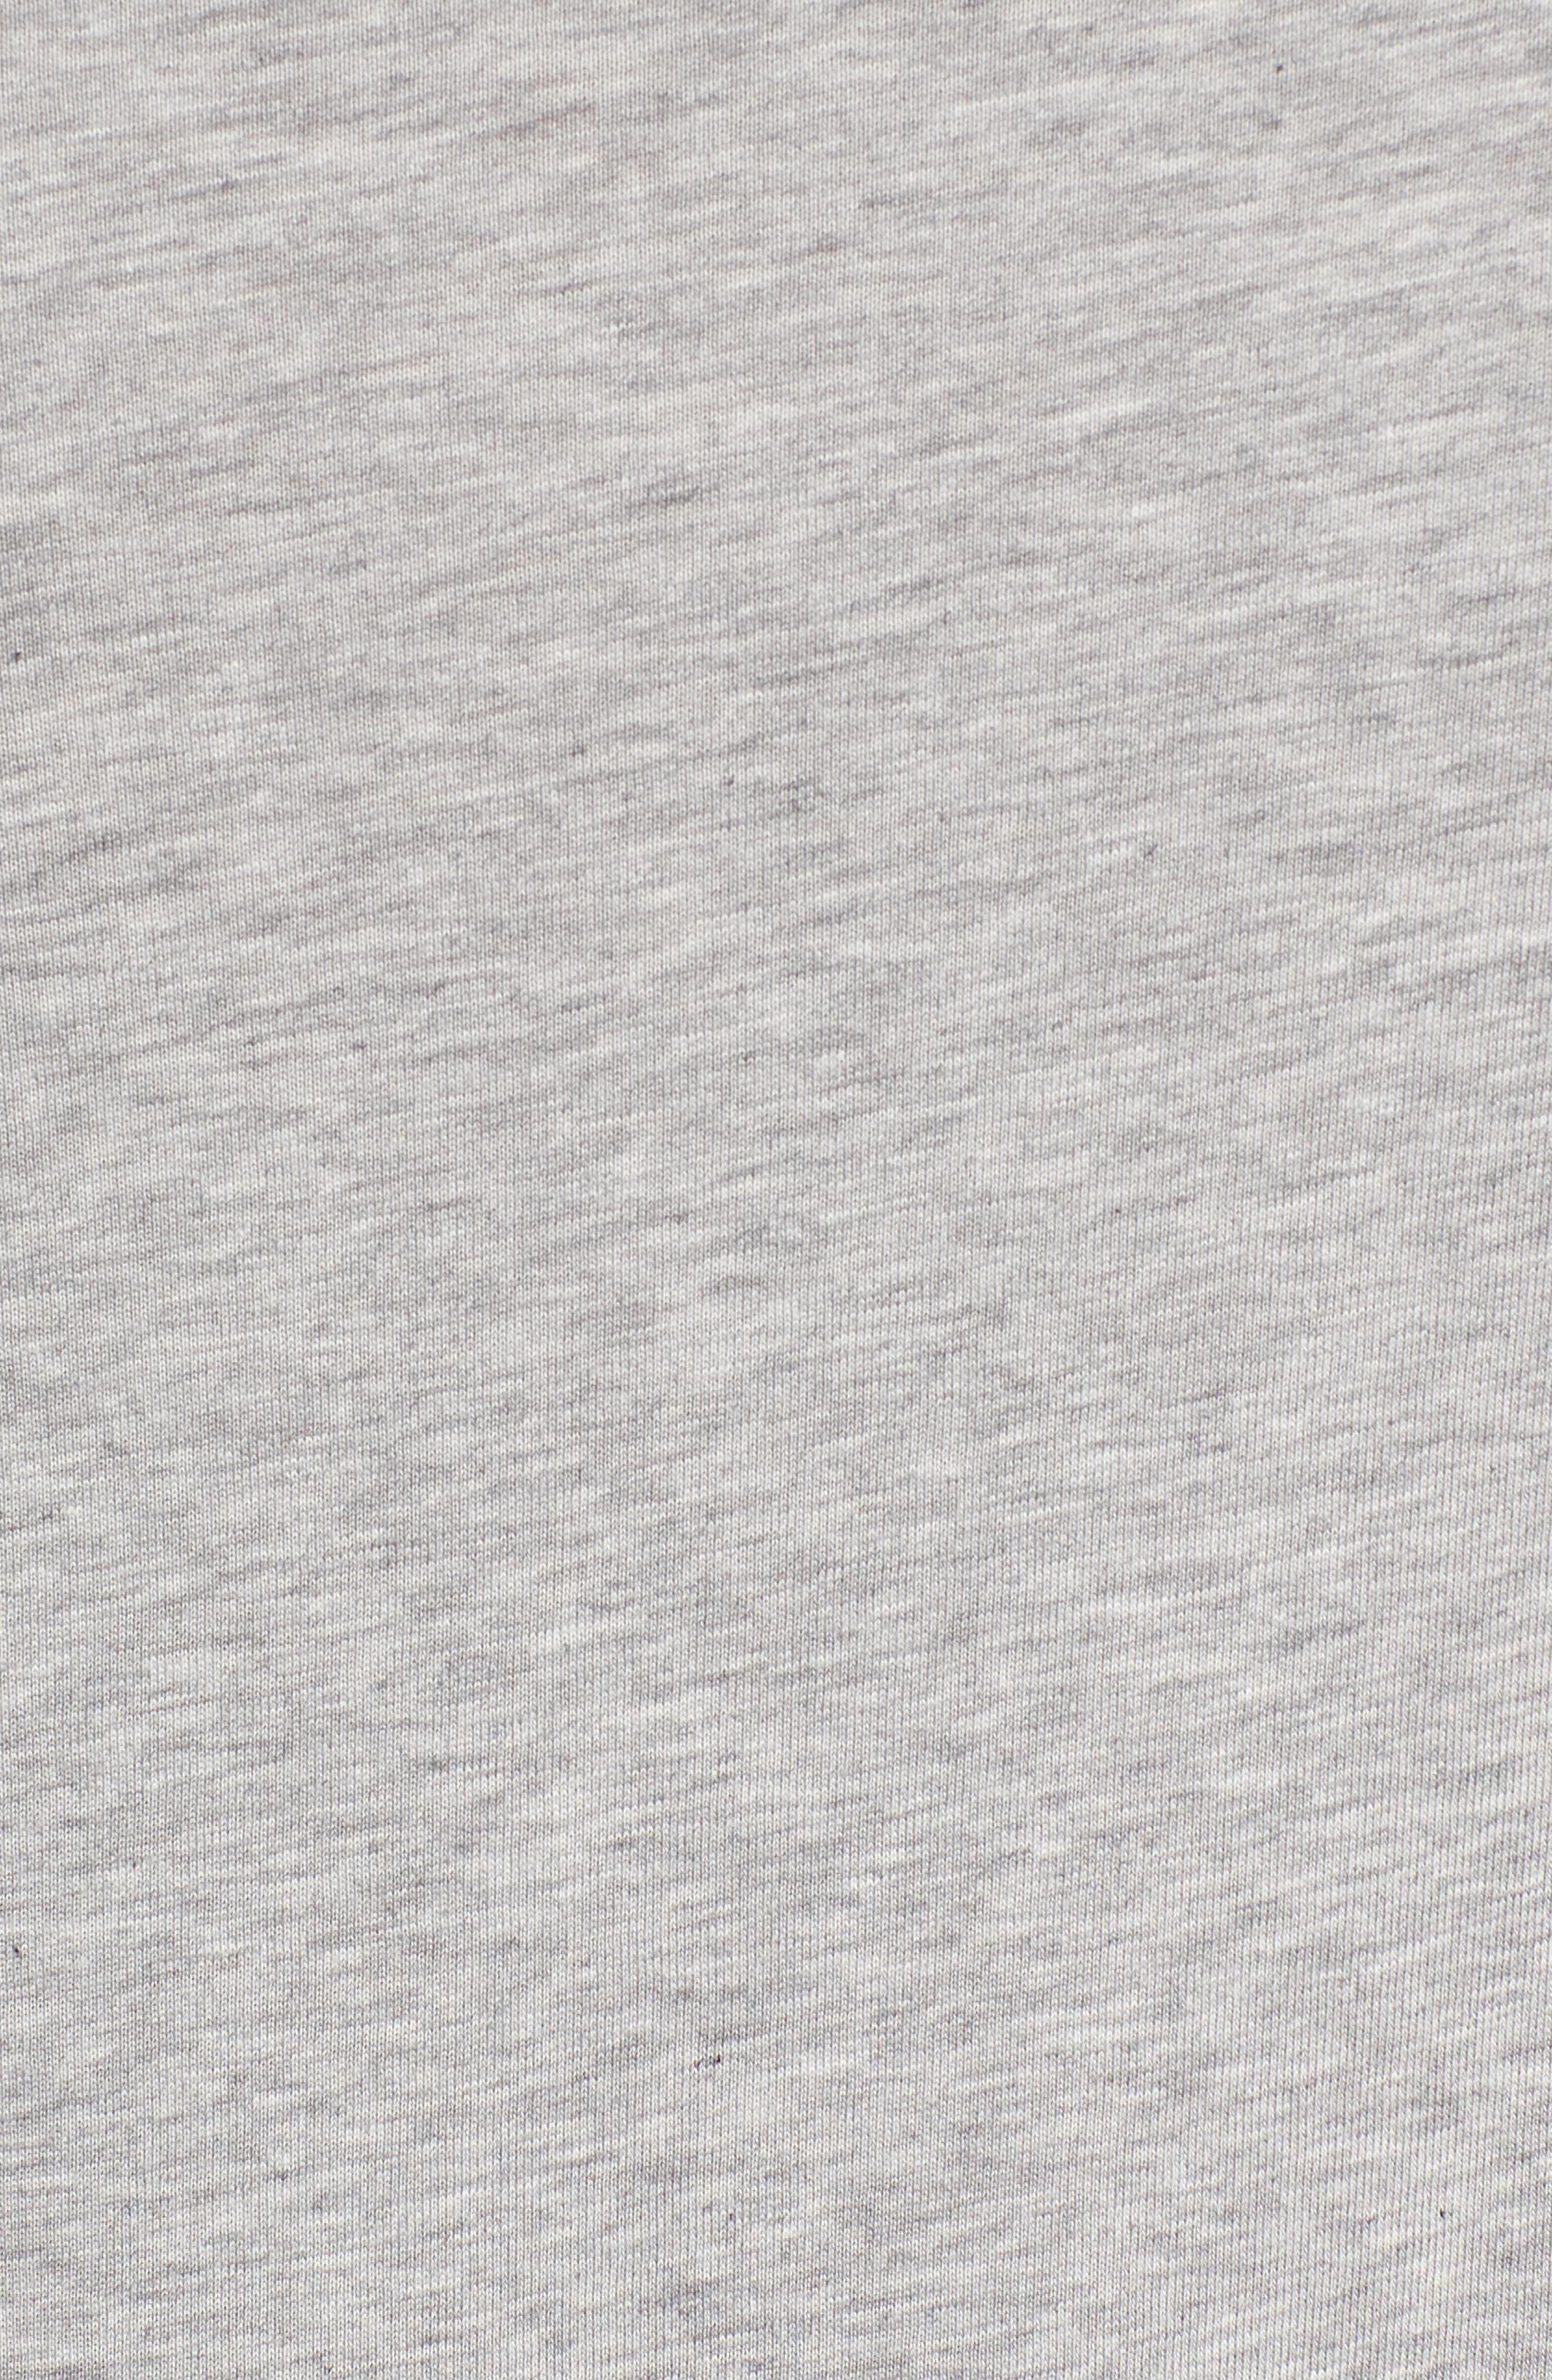 Heather Tech Crewneck T-Shirt,                             Alternate thumbnail 5, color,                             ATHLETIC GREY